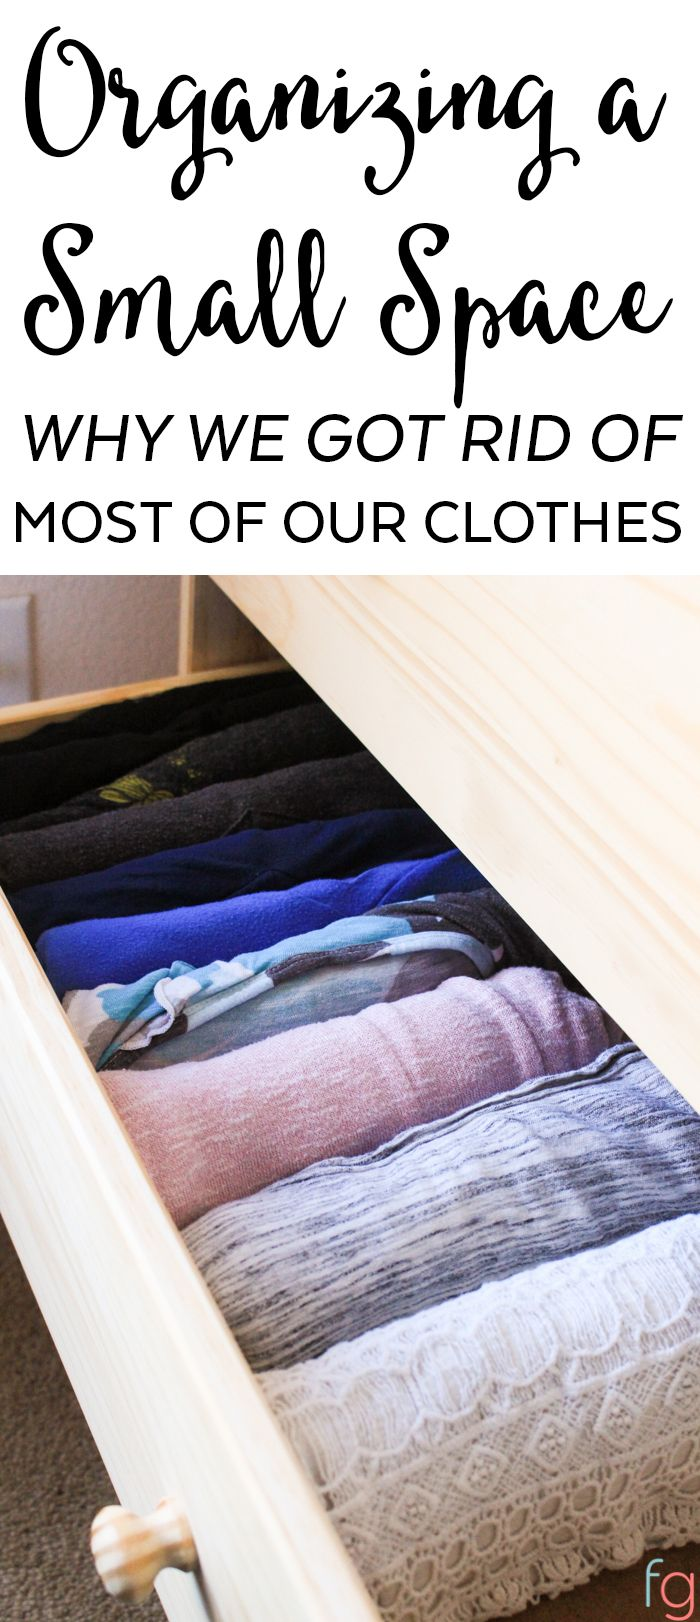 best storage images on pinterest organization ideas cleaning